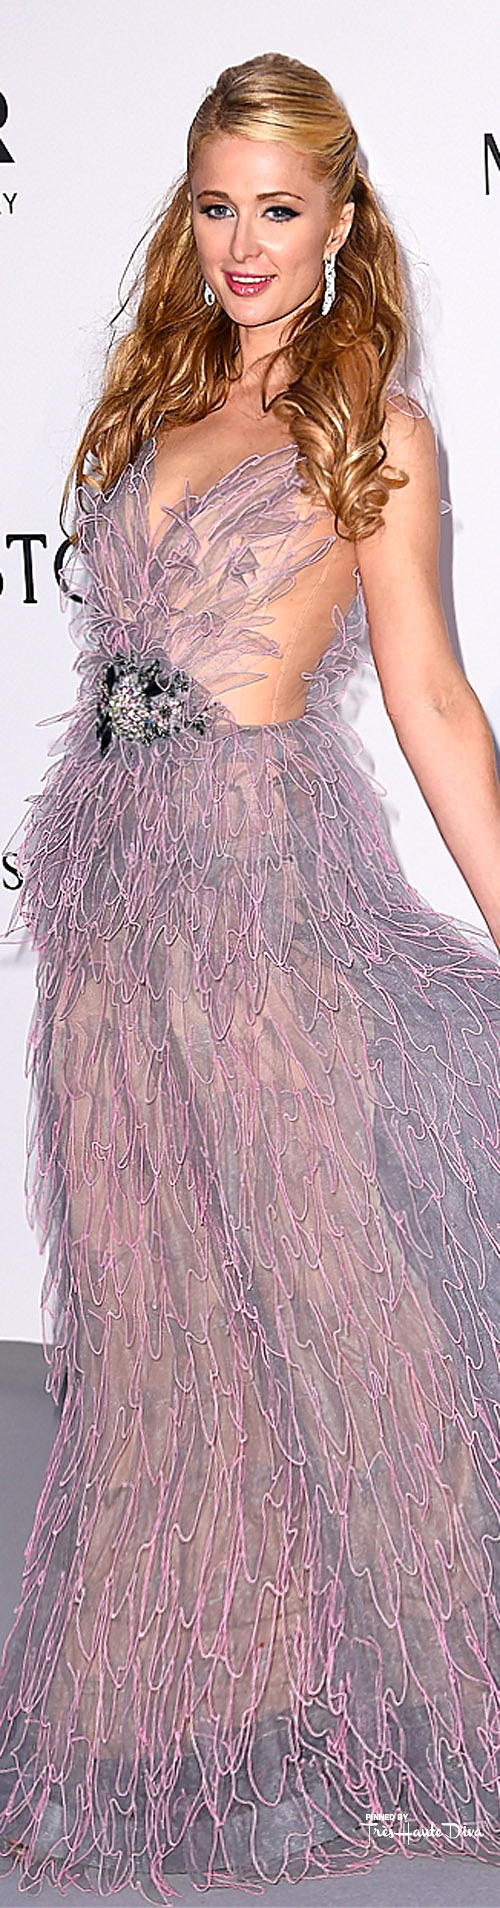 Paris Hilton in Yulia Yanina  dailymail.co.uk